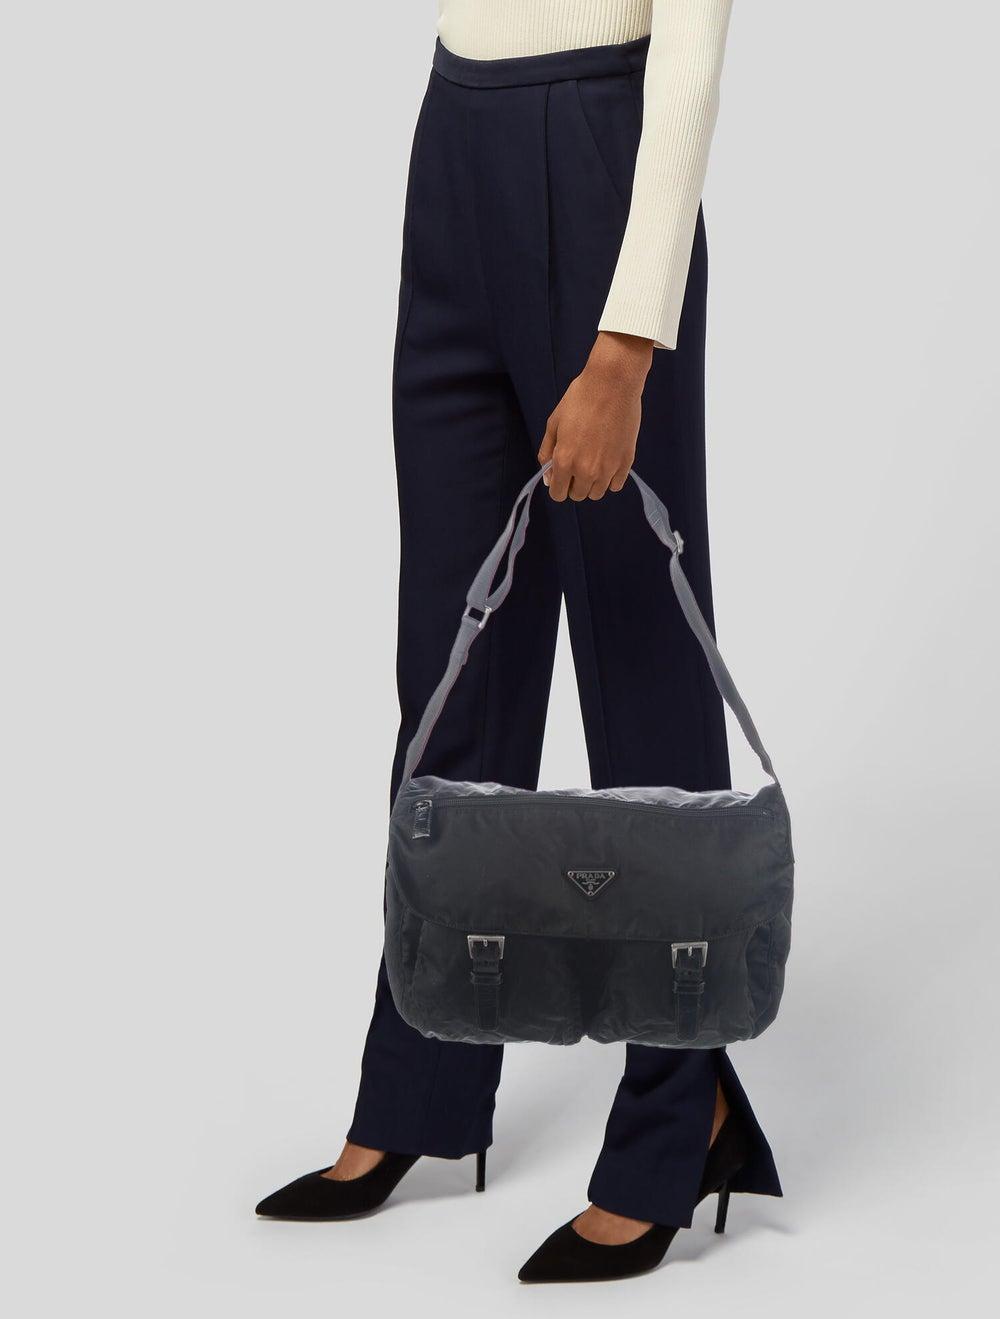 Prada Vela Messenger Bag Black - image 2